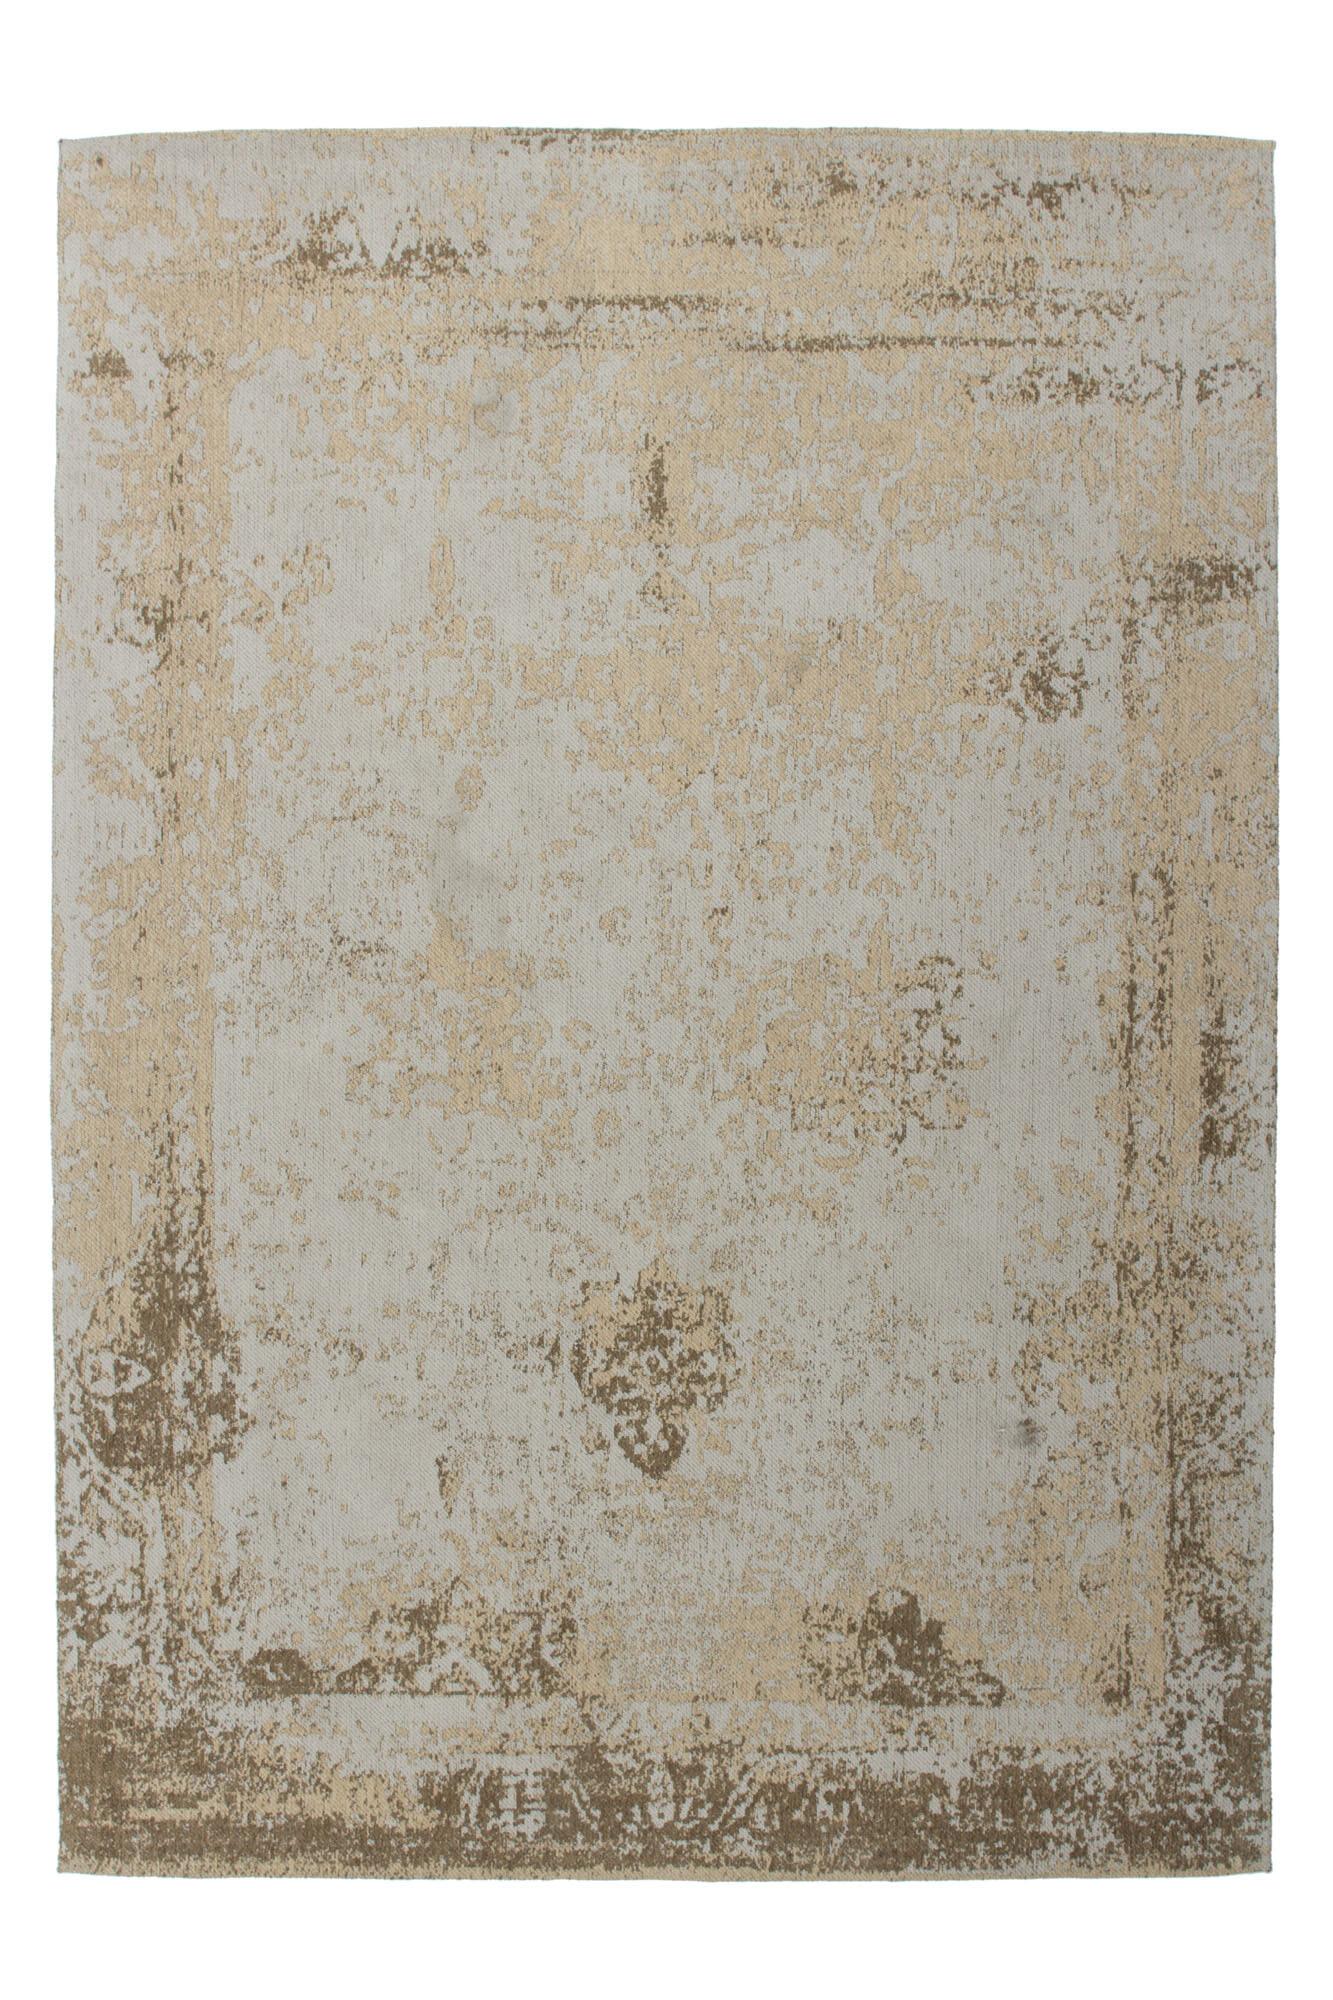 Kayoom Vloerkleed 'Nostalgia 285' kleur Zand, 80 x 150cm